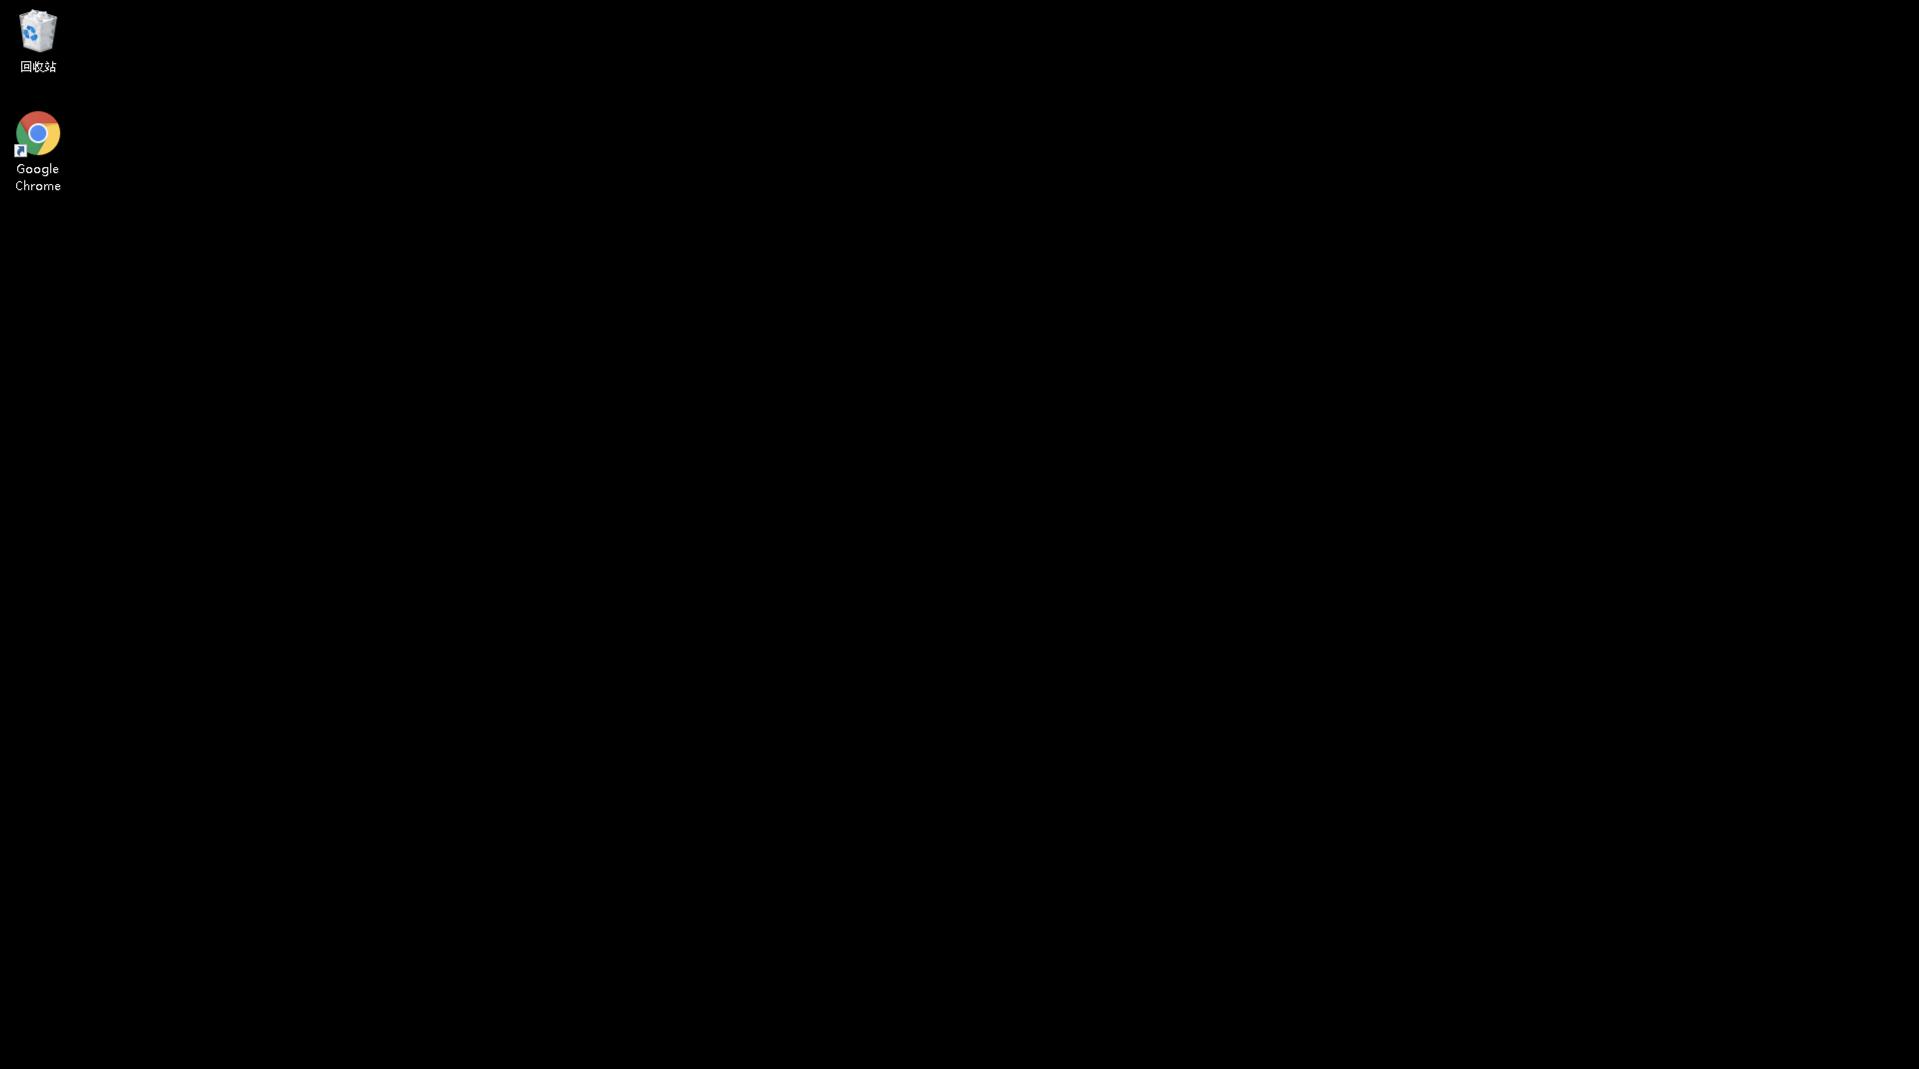 支持通过VS Code直连Linux-SSH协议资产,JumpServer v2.11.0发布